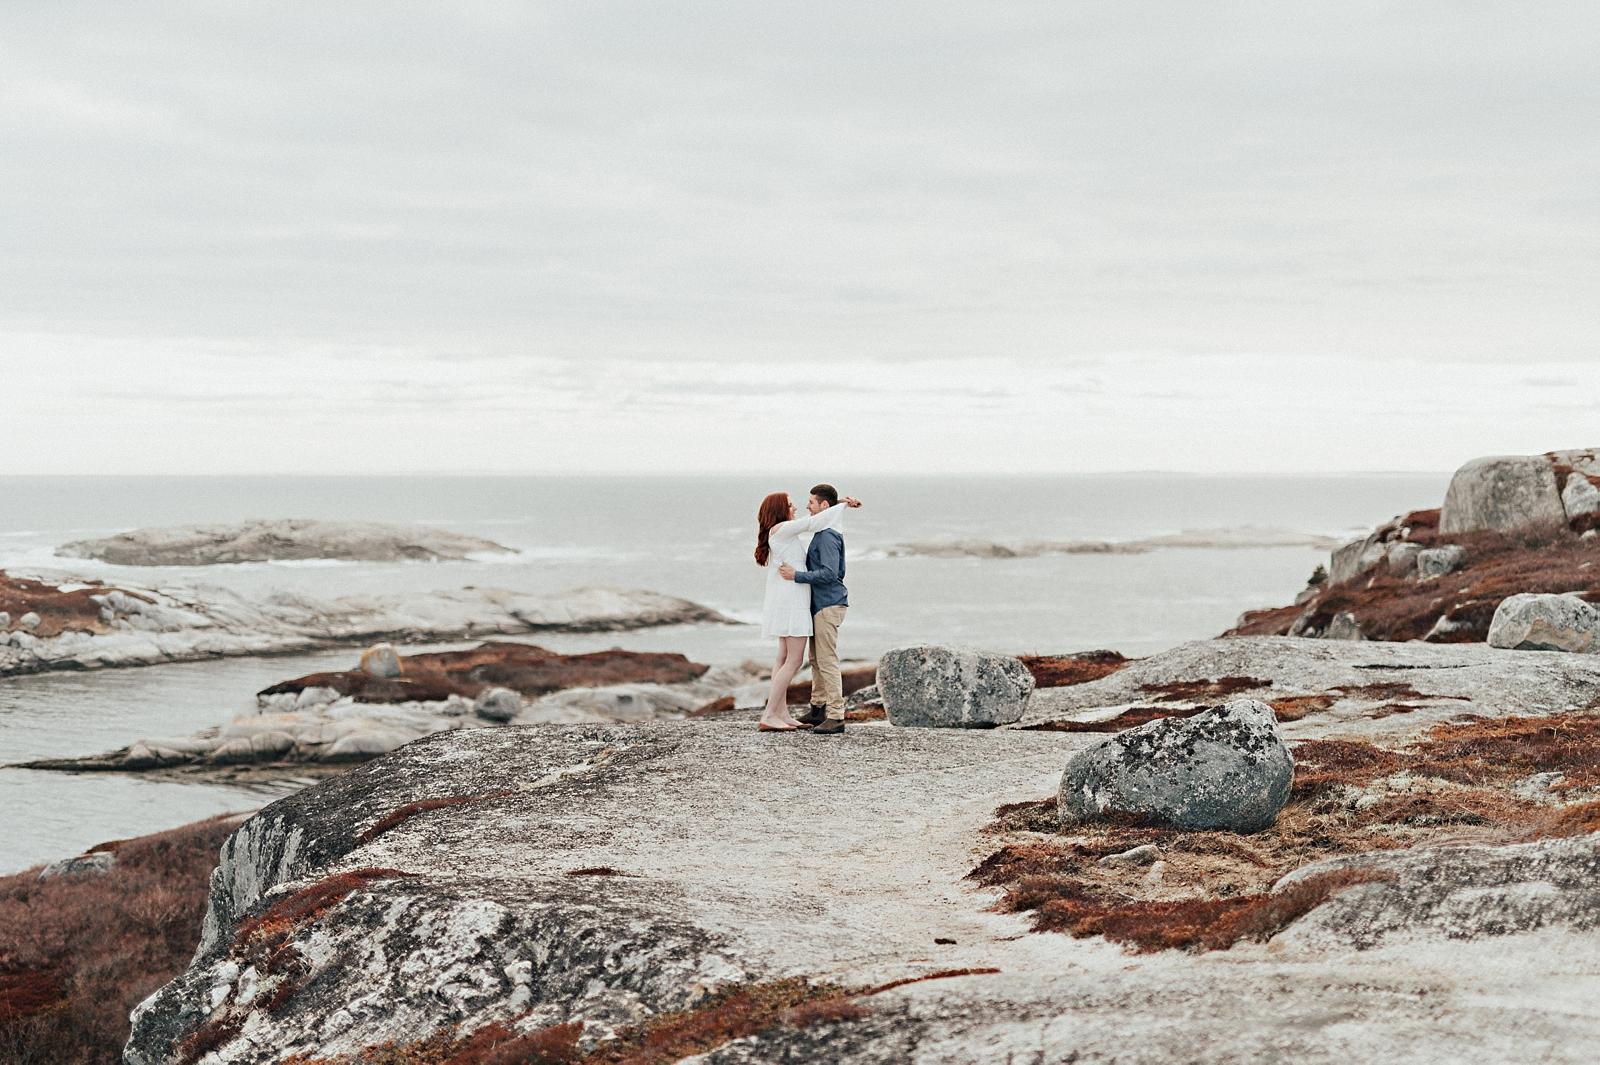 Halifax-Wedding-Photographer_Annie&Ryan_Ocean-Engagement-Shoot_11.jpg